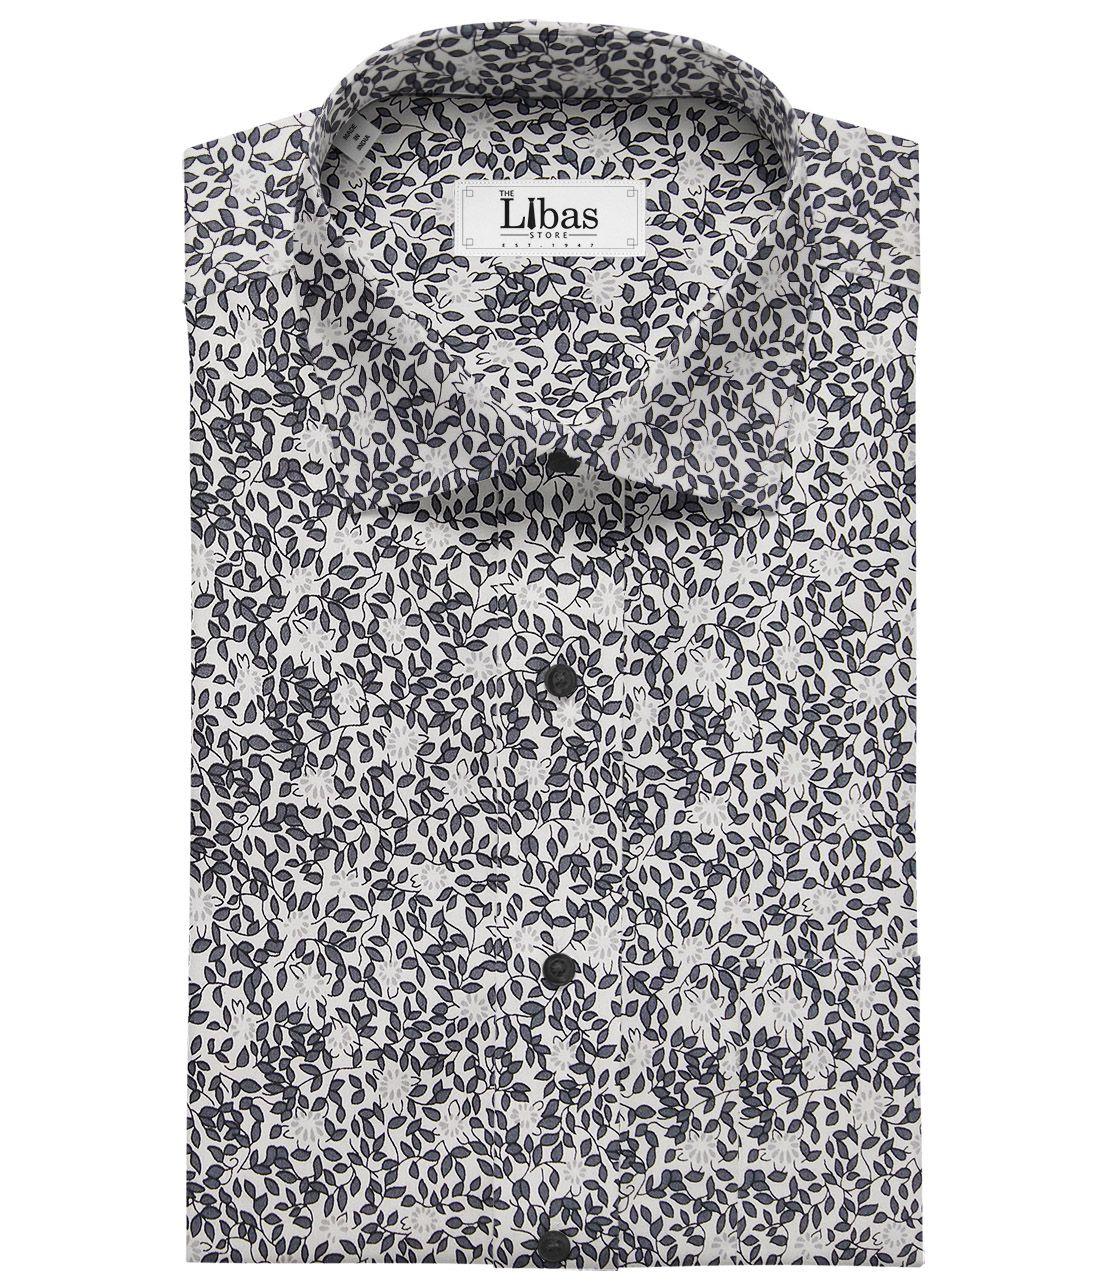 14e8f9b61 Solino White 100% Premium Cotton Dark Grey Floral Printed Shirt Fabric  (1.60 M)